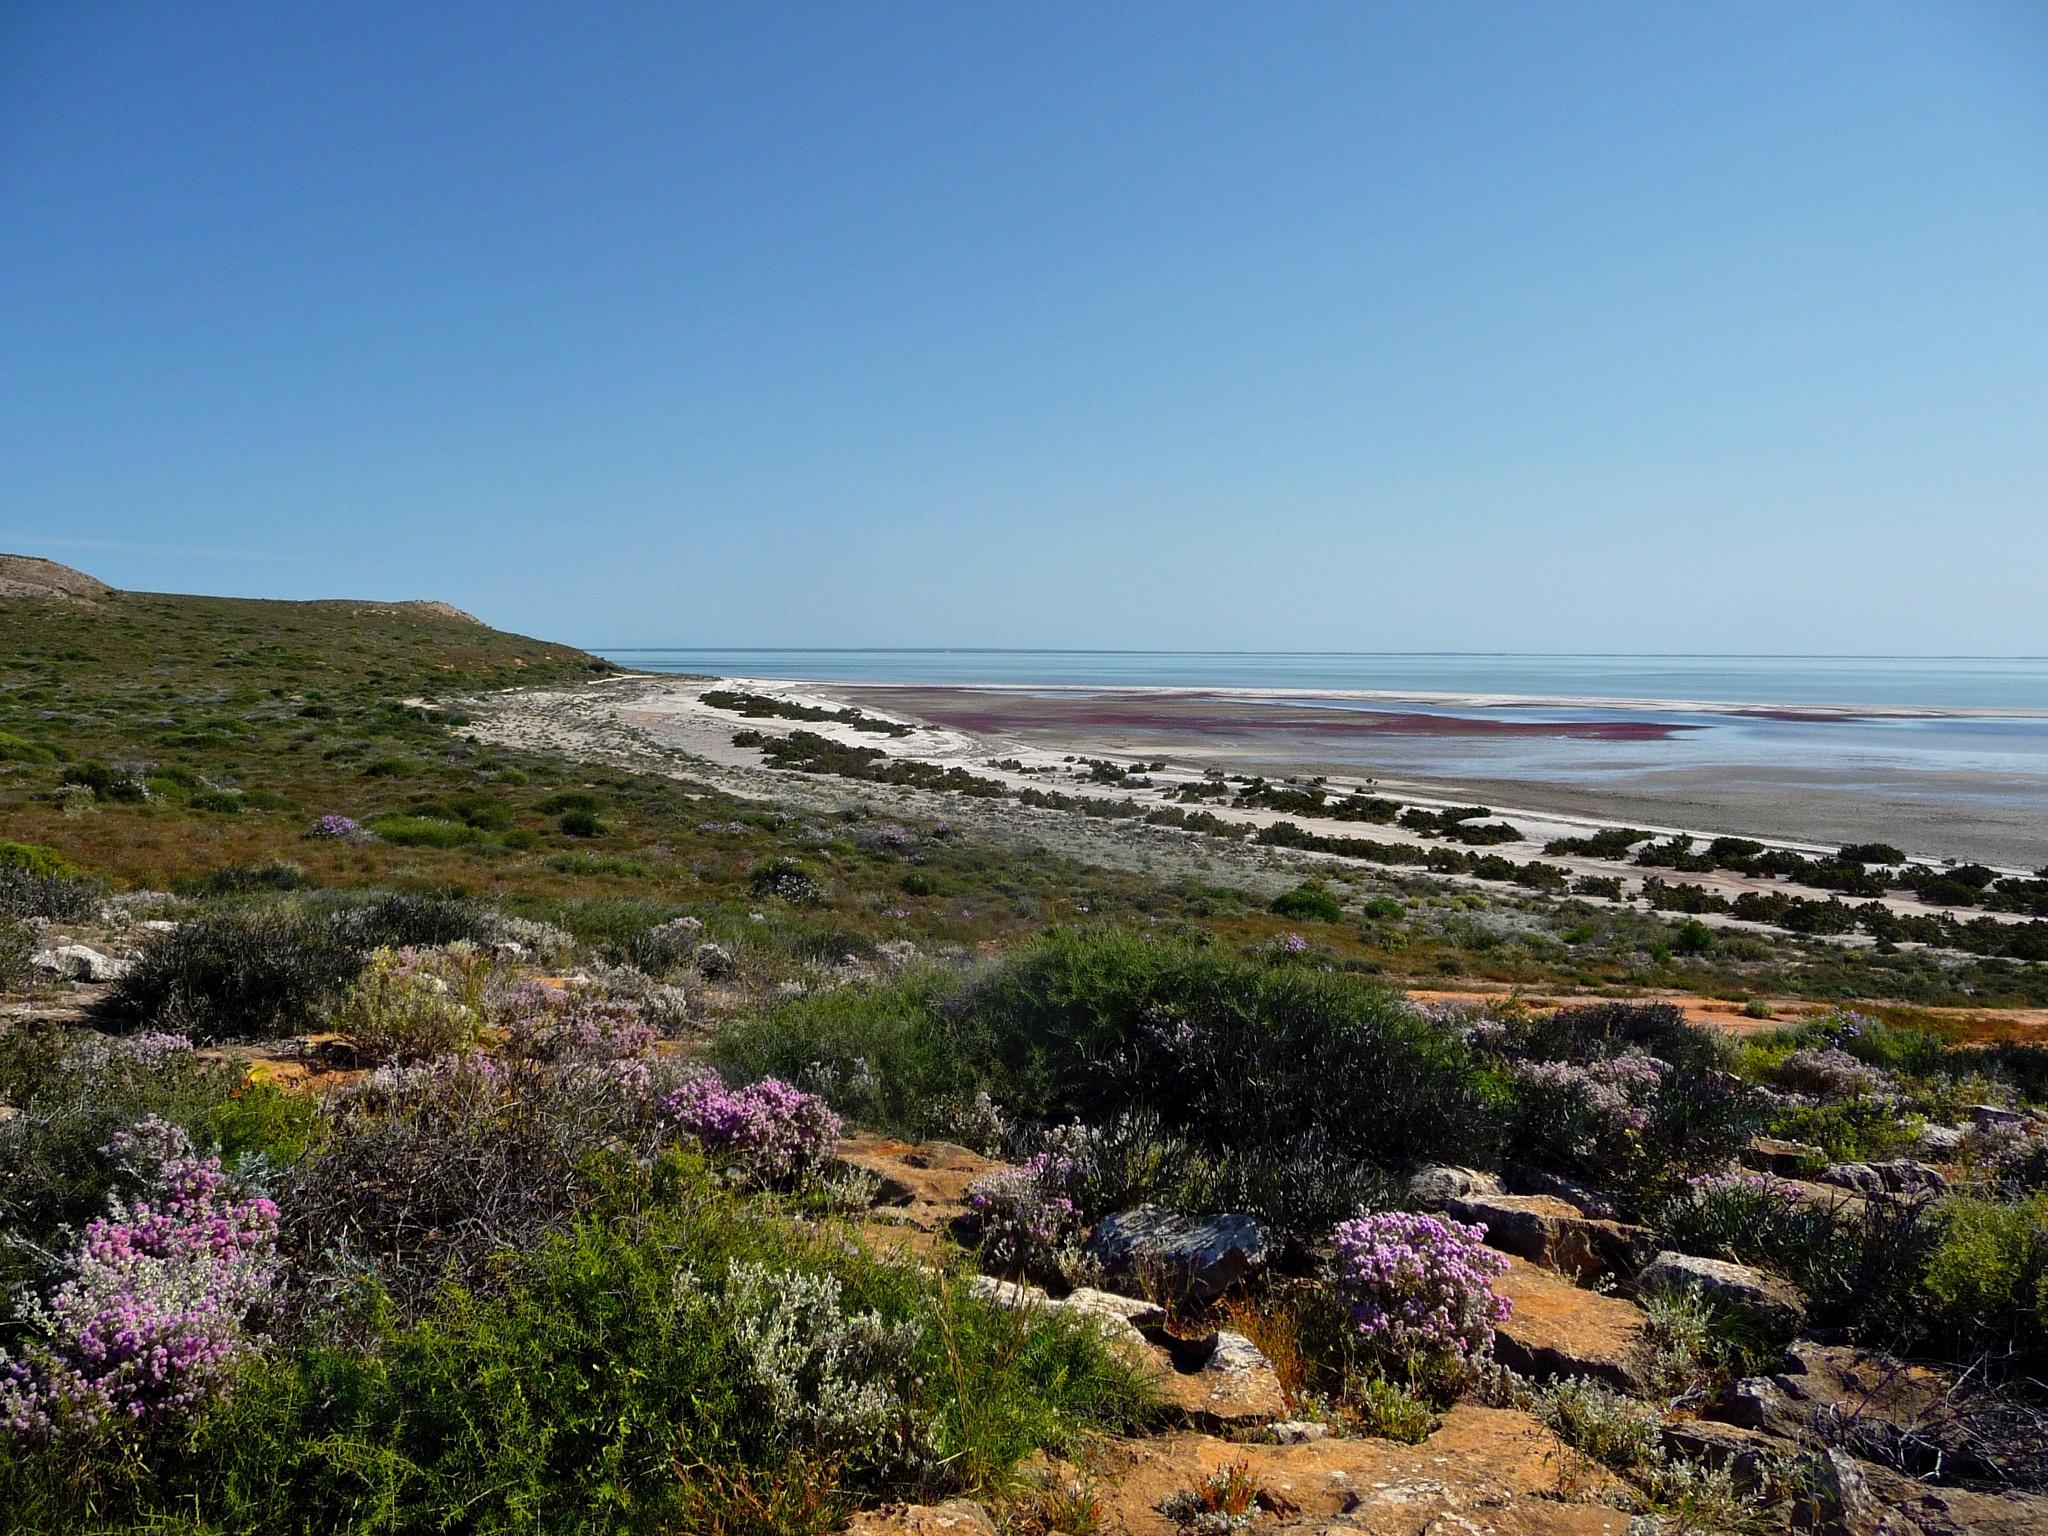 Shark bay coastline. by Rovert